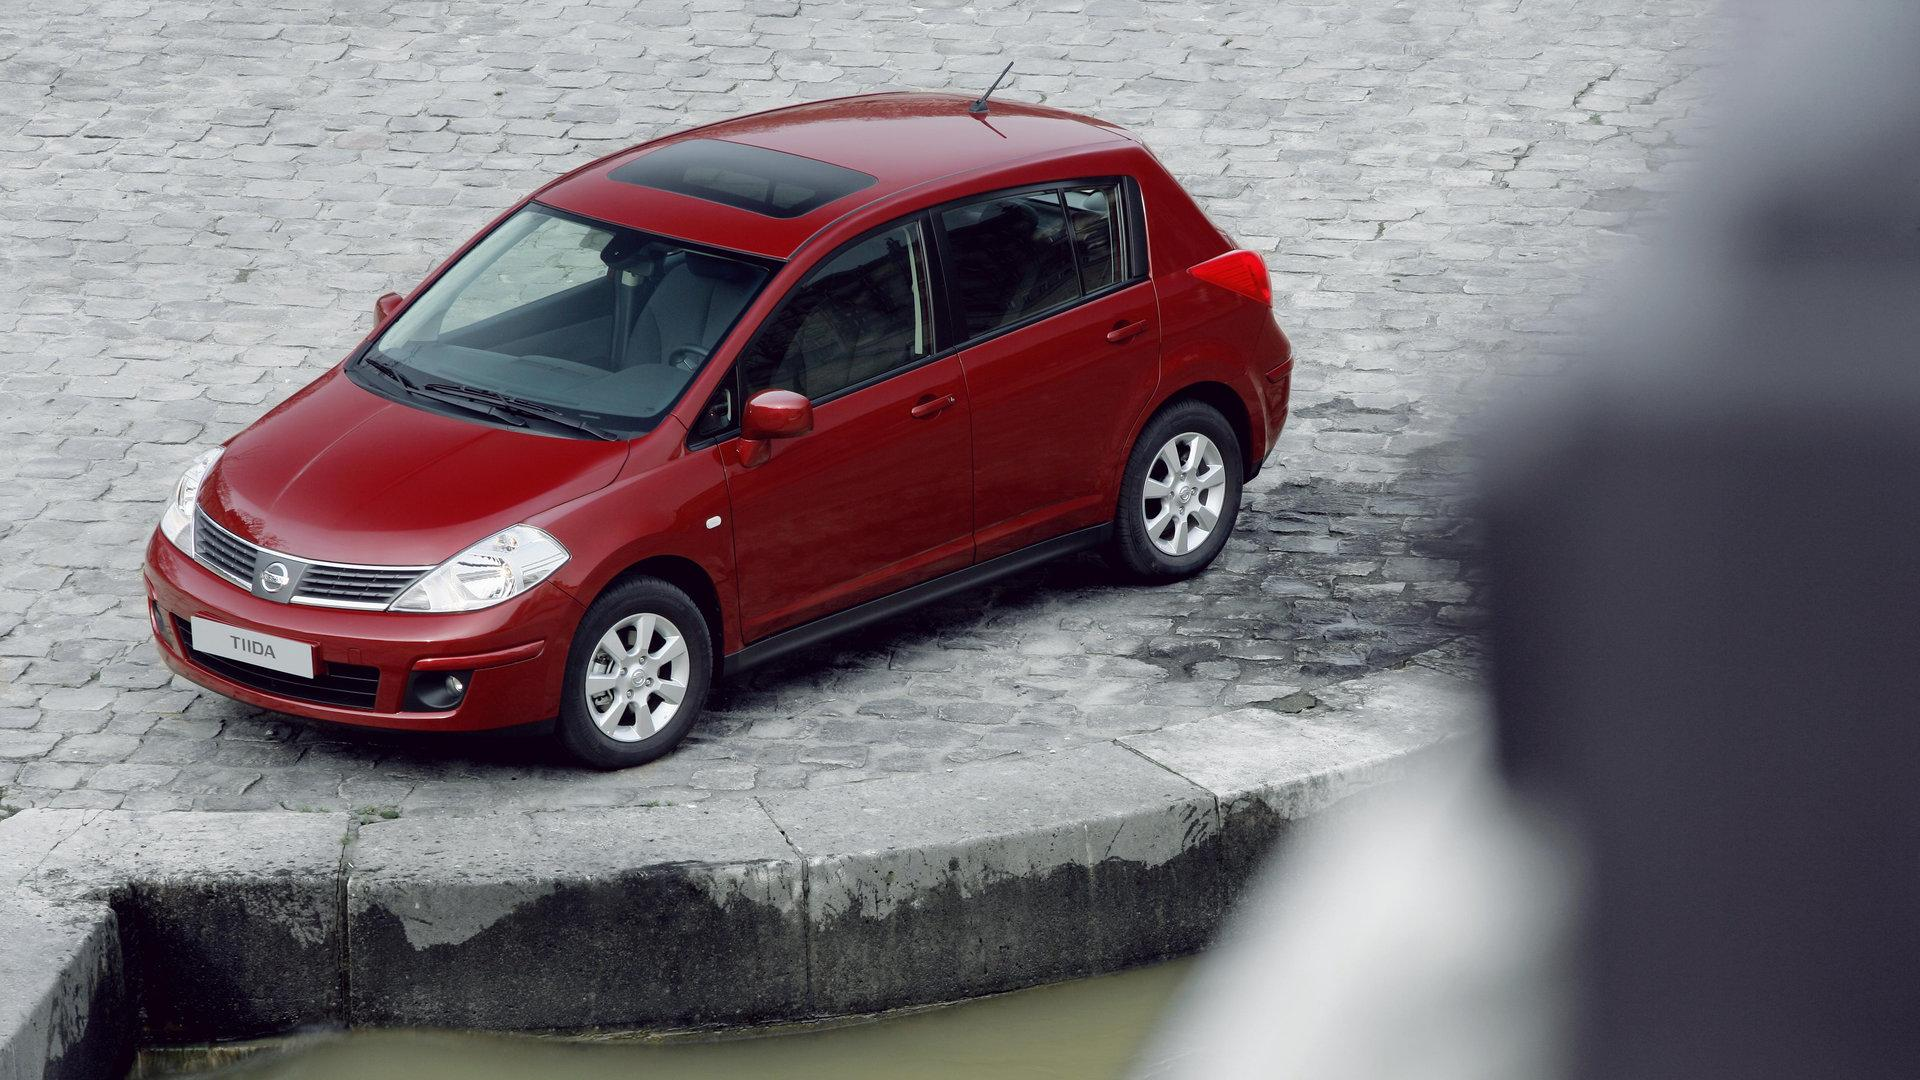 Nissan Tiida hatchback C11 2